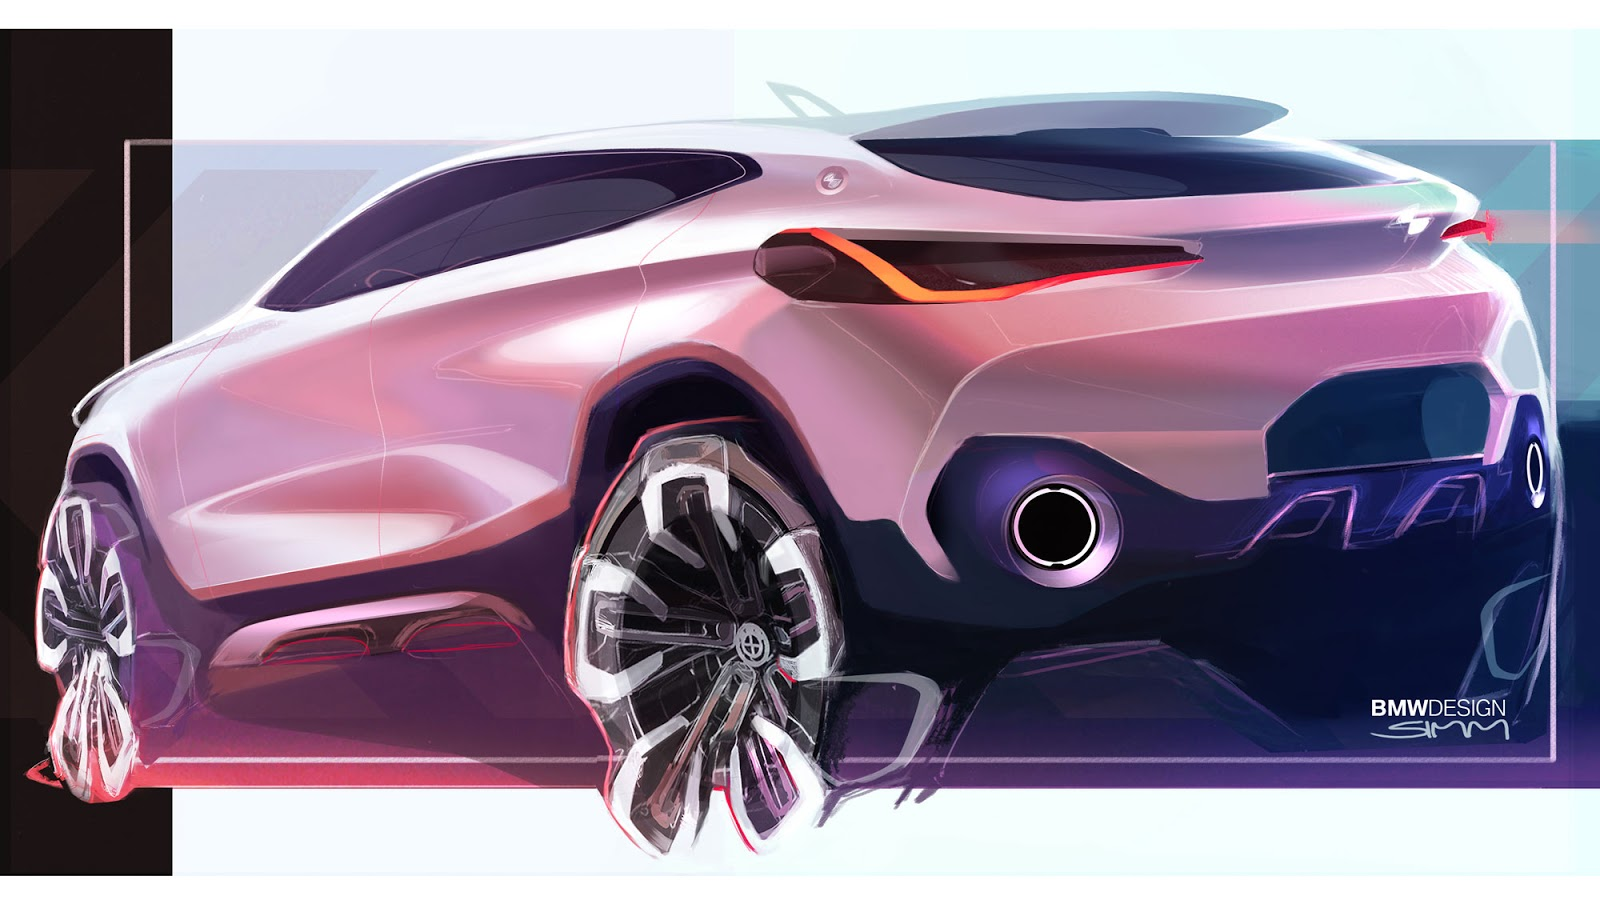 BMW X2 sketch by Sebastian Simm - rear quarter view in pink